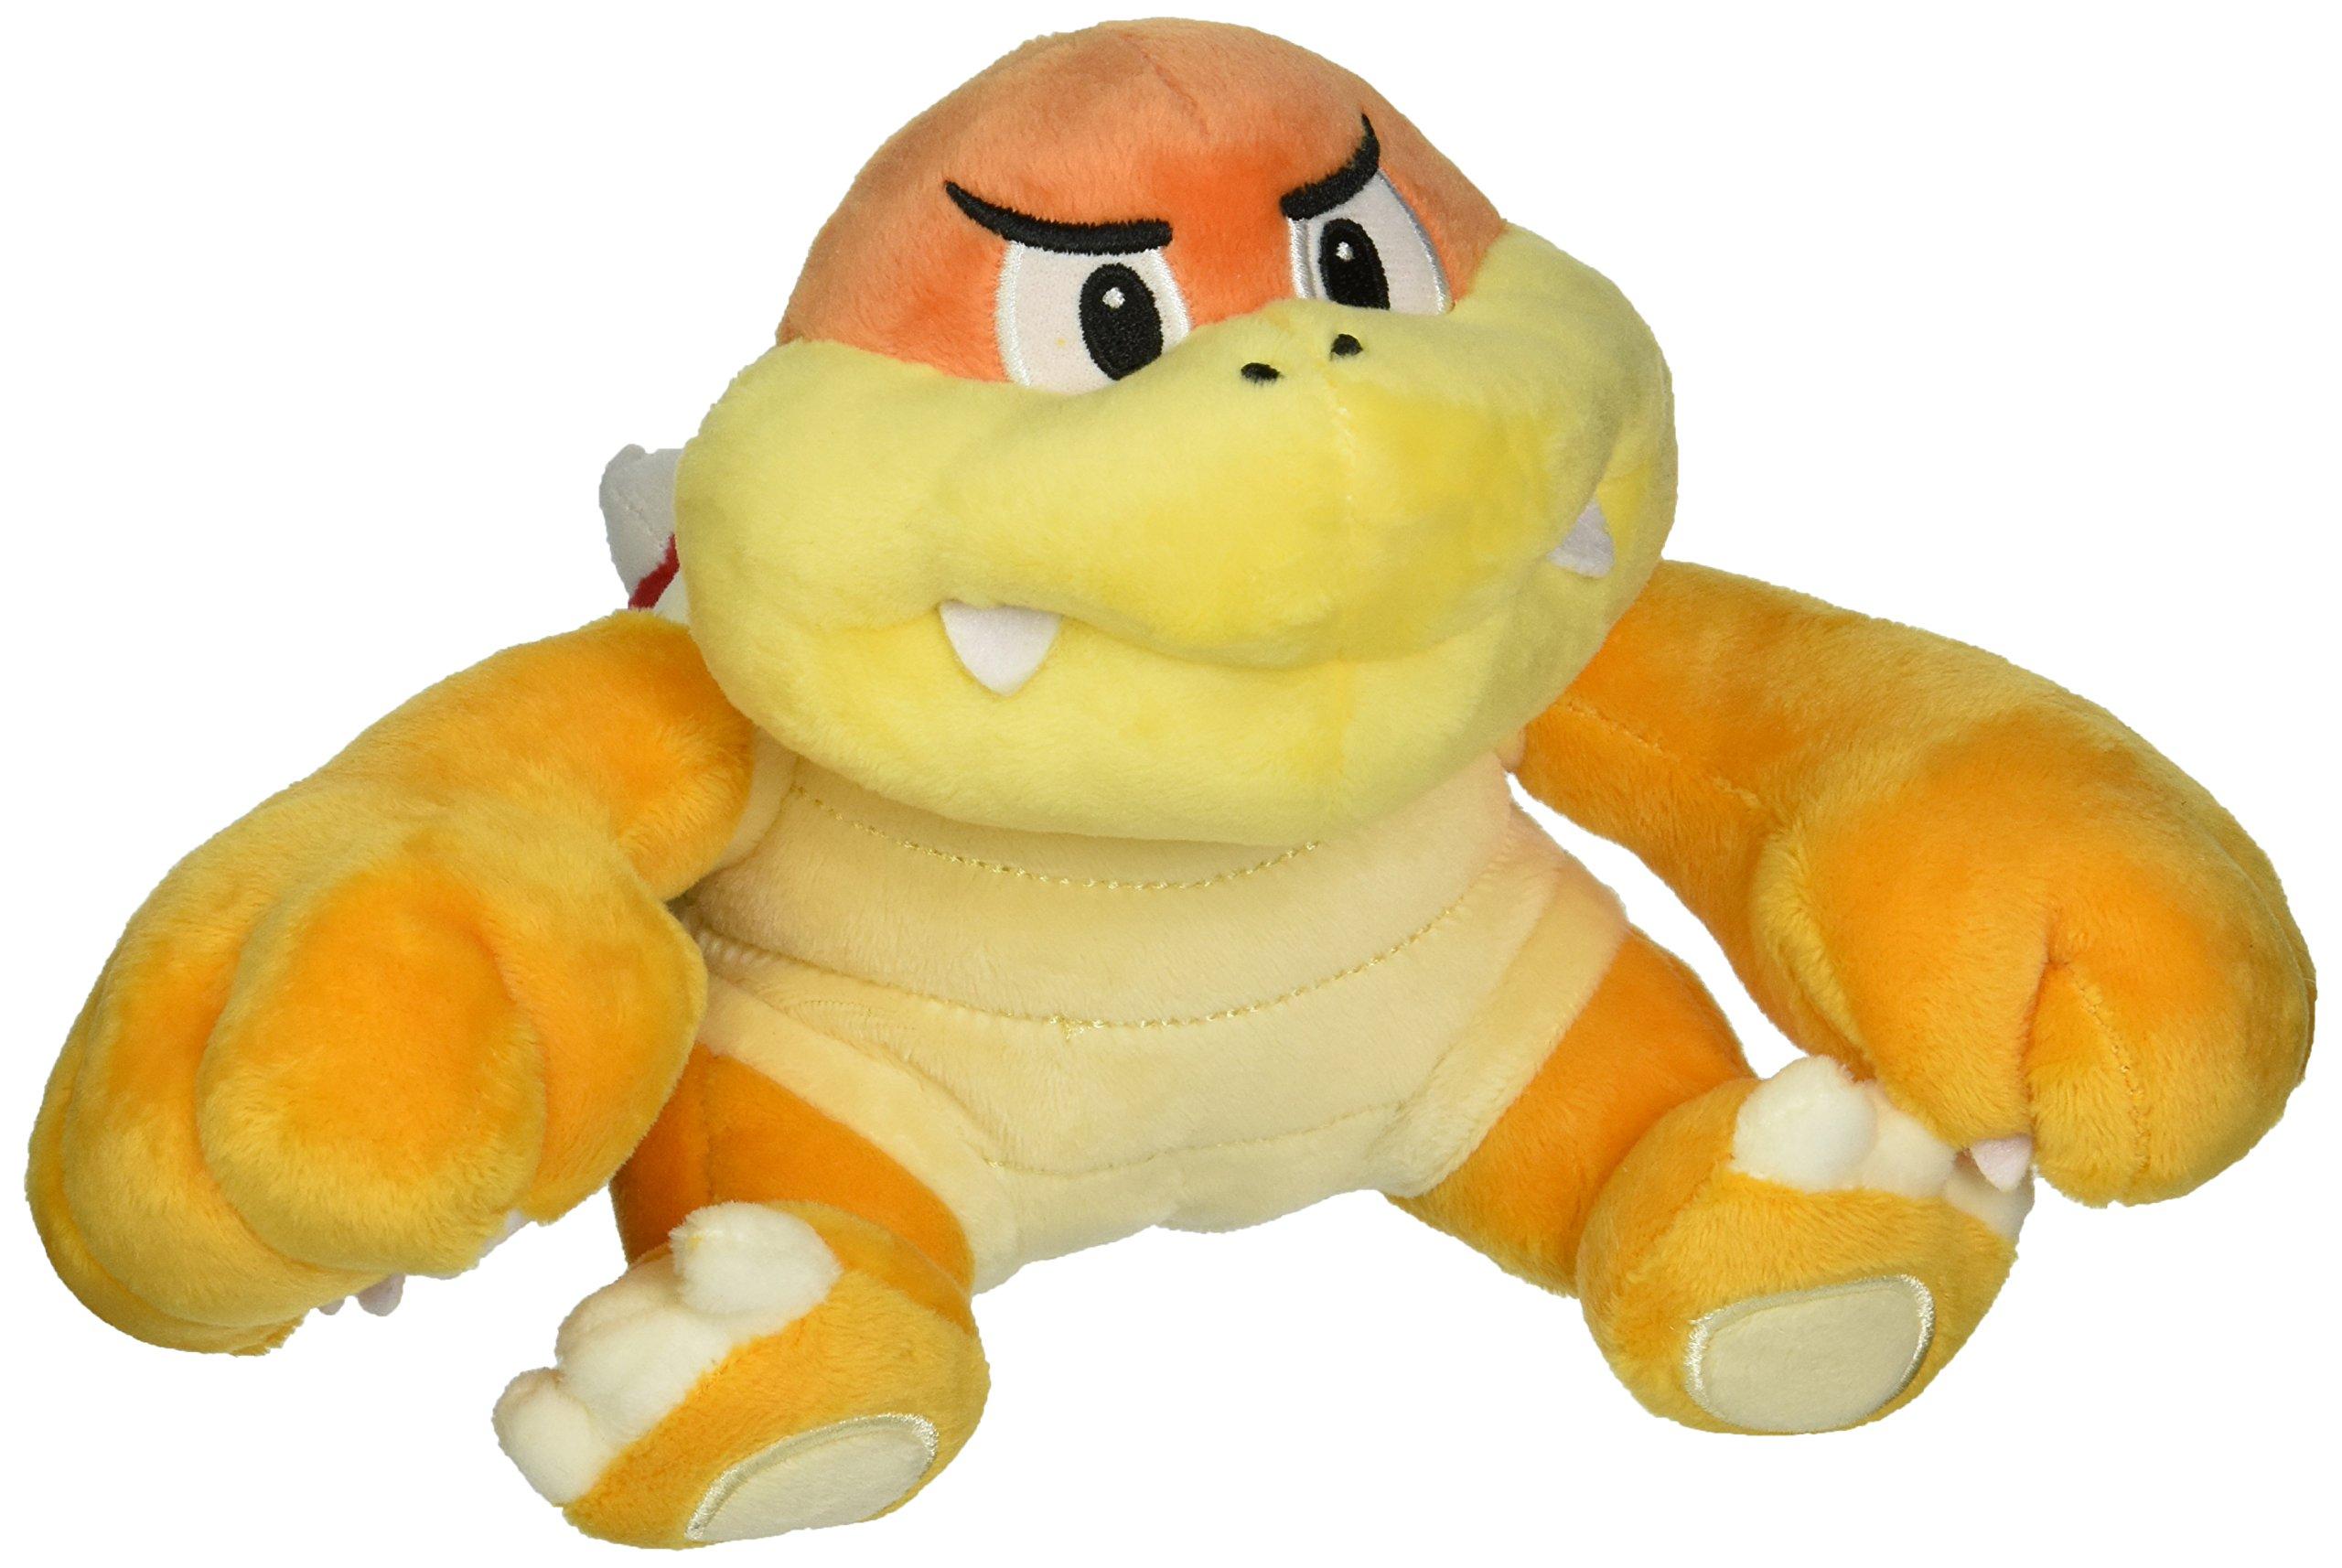 Little Buddy USA Super Mario All Star Collection Bun Bun/Boom Boom Stuffed Plush, Yellow, 6.5'' by Little Buddy